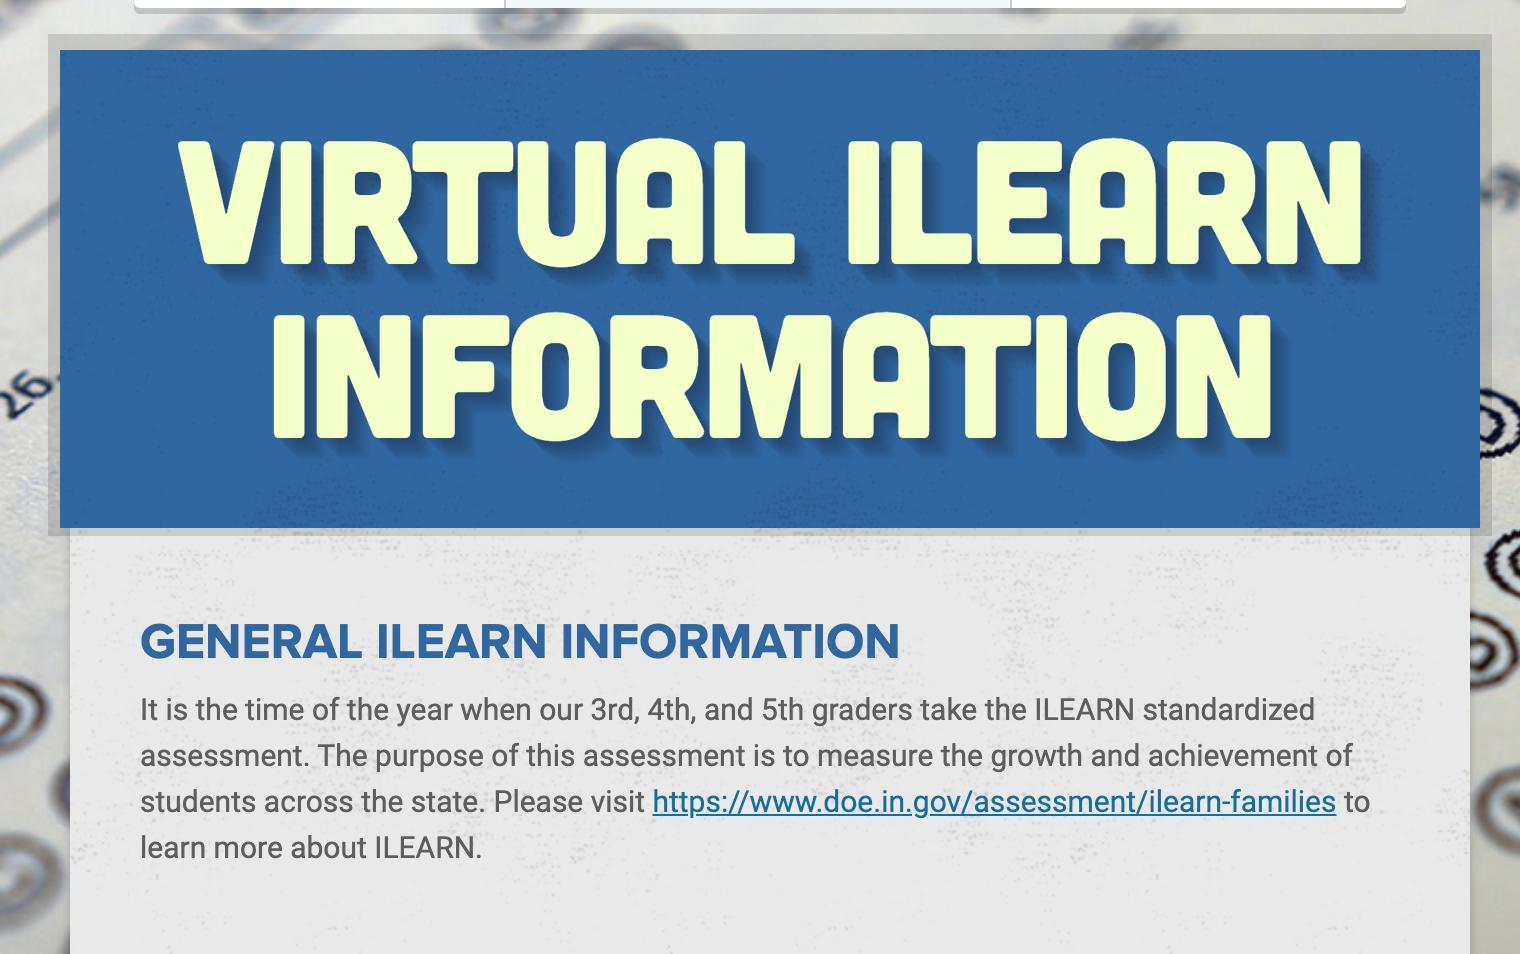 Virtual ILEARN Newsletter